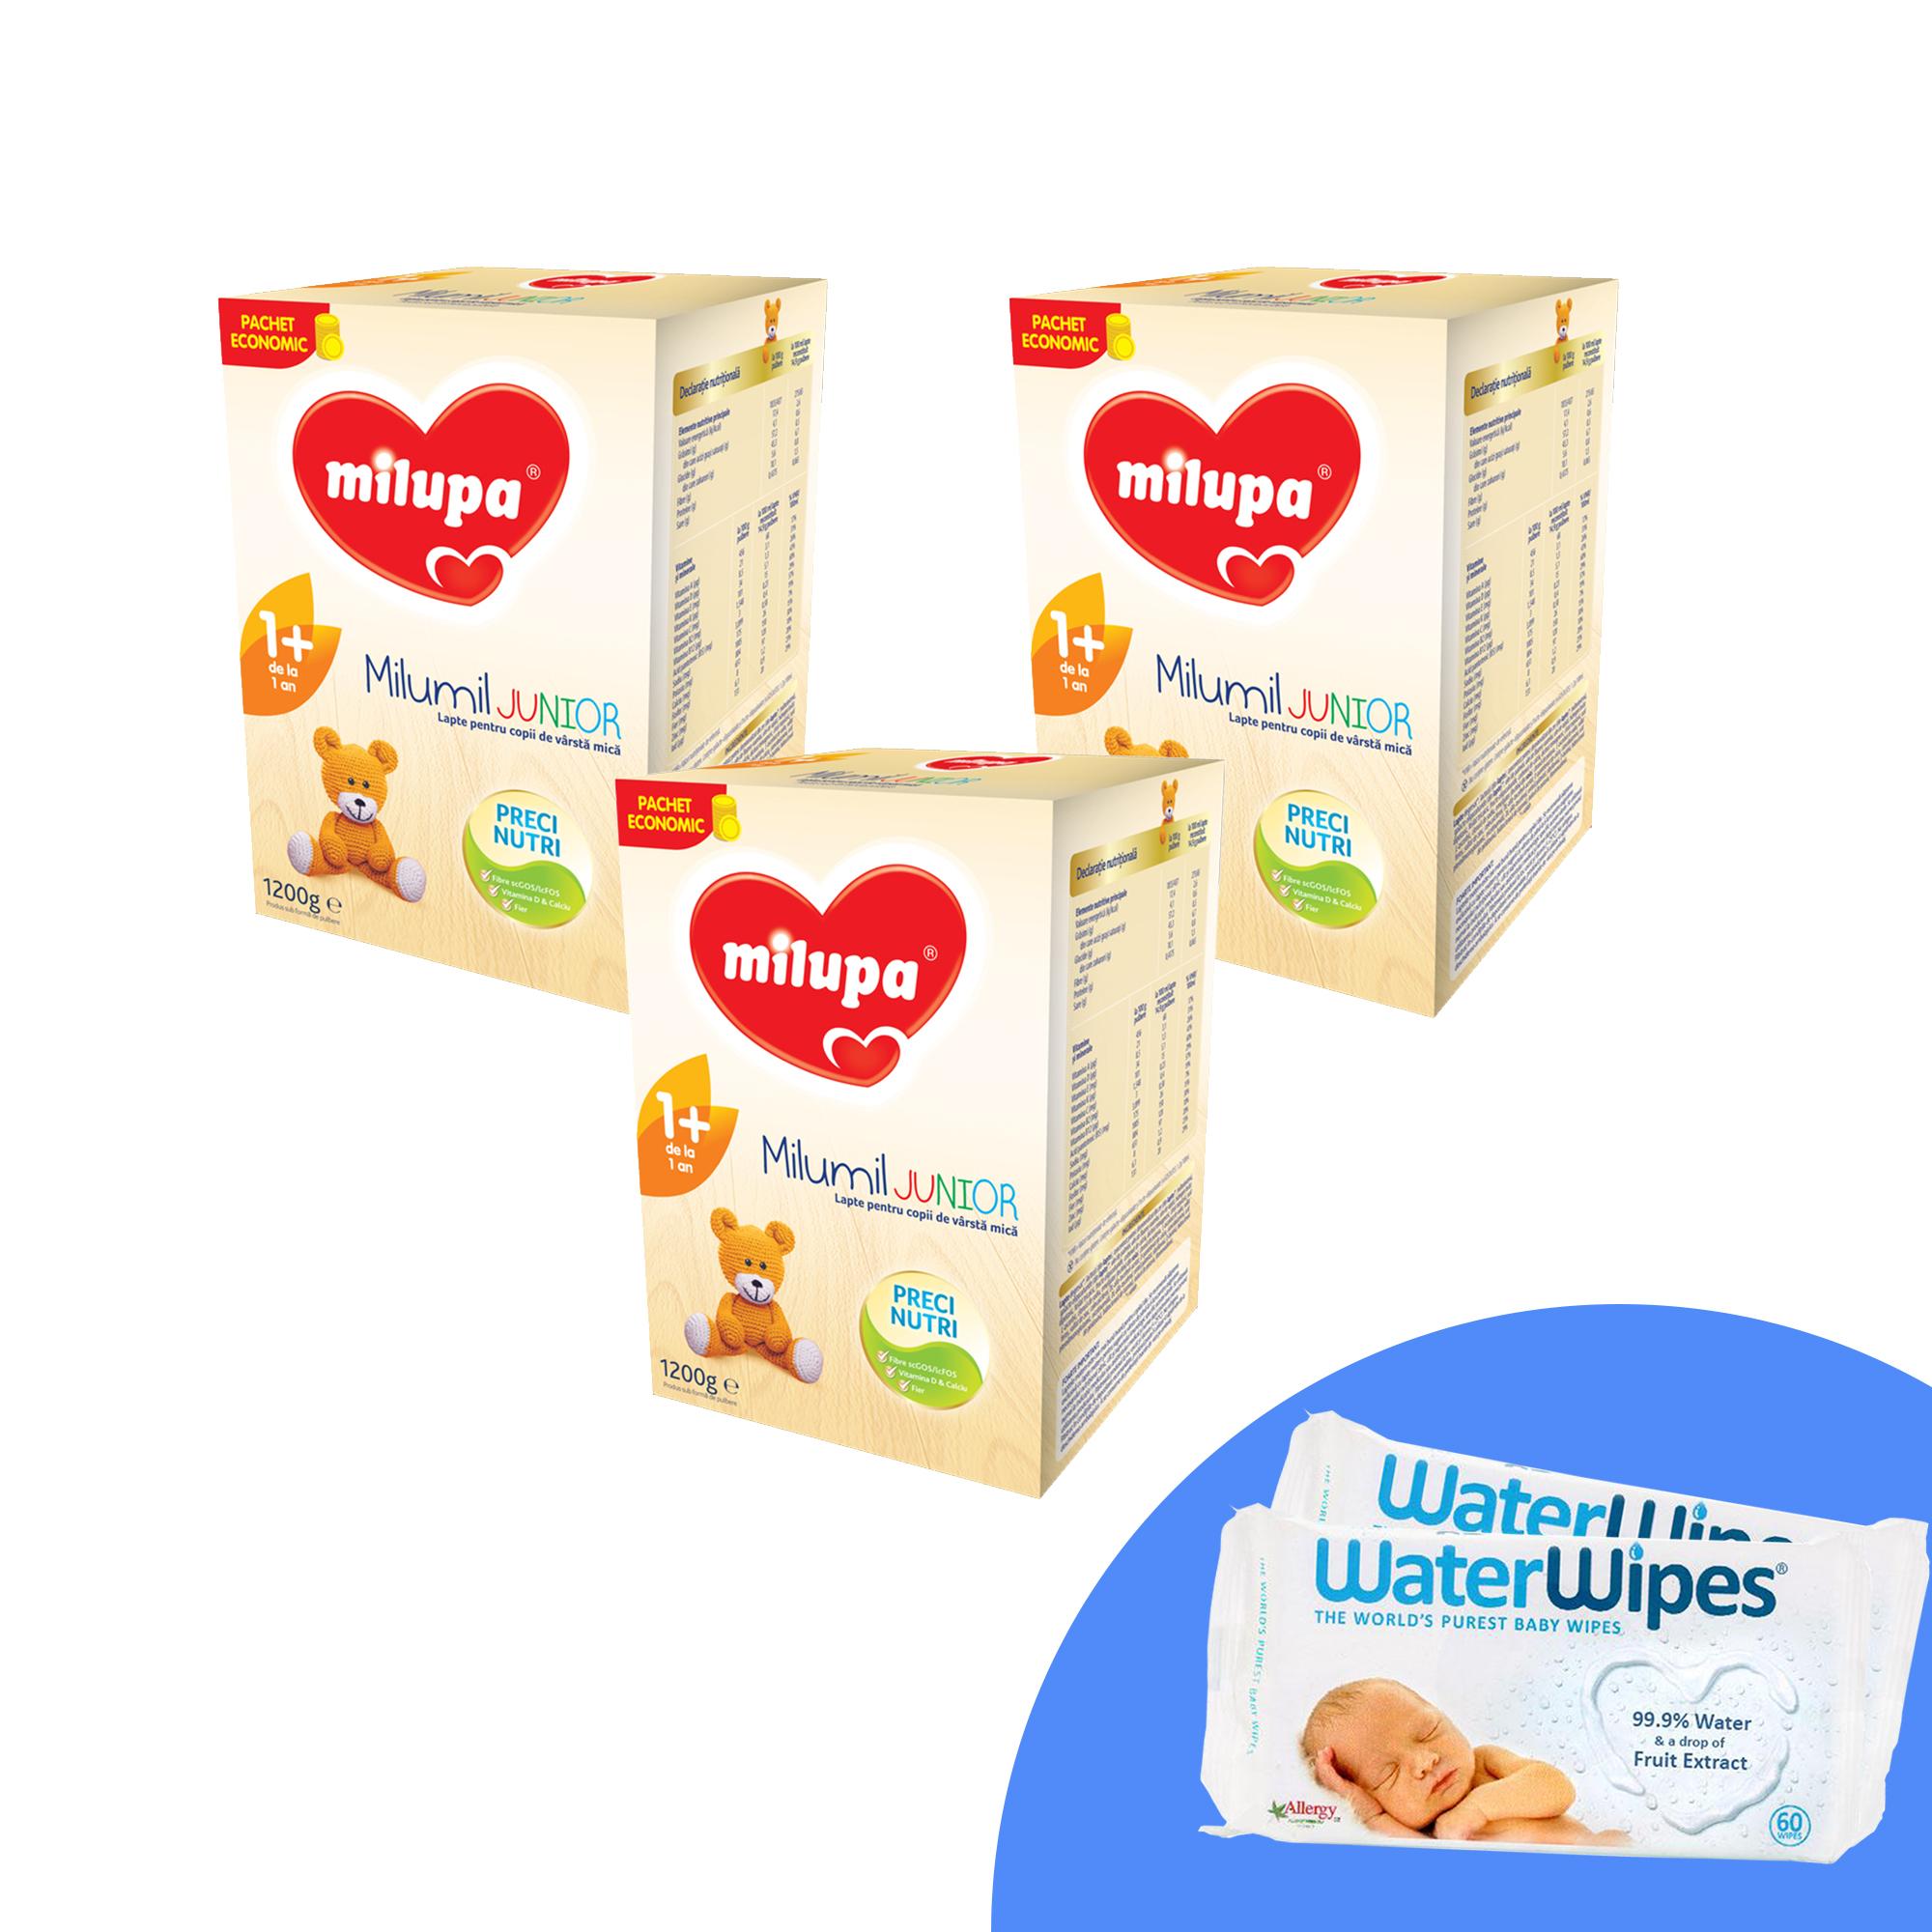 Pachet 3 buc x  Lapte praf Milupa Milumil Junior 1+, 1200g, 12luni+ si 2 x Servetele umede pentru bebelusi, WaterWipes, 60 buc